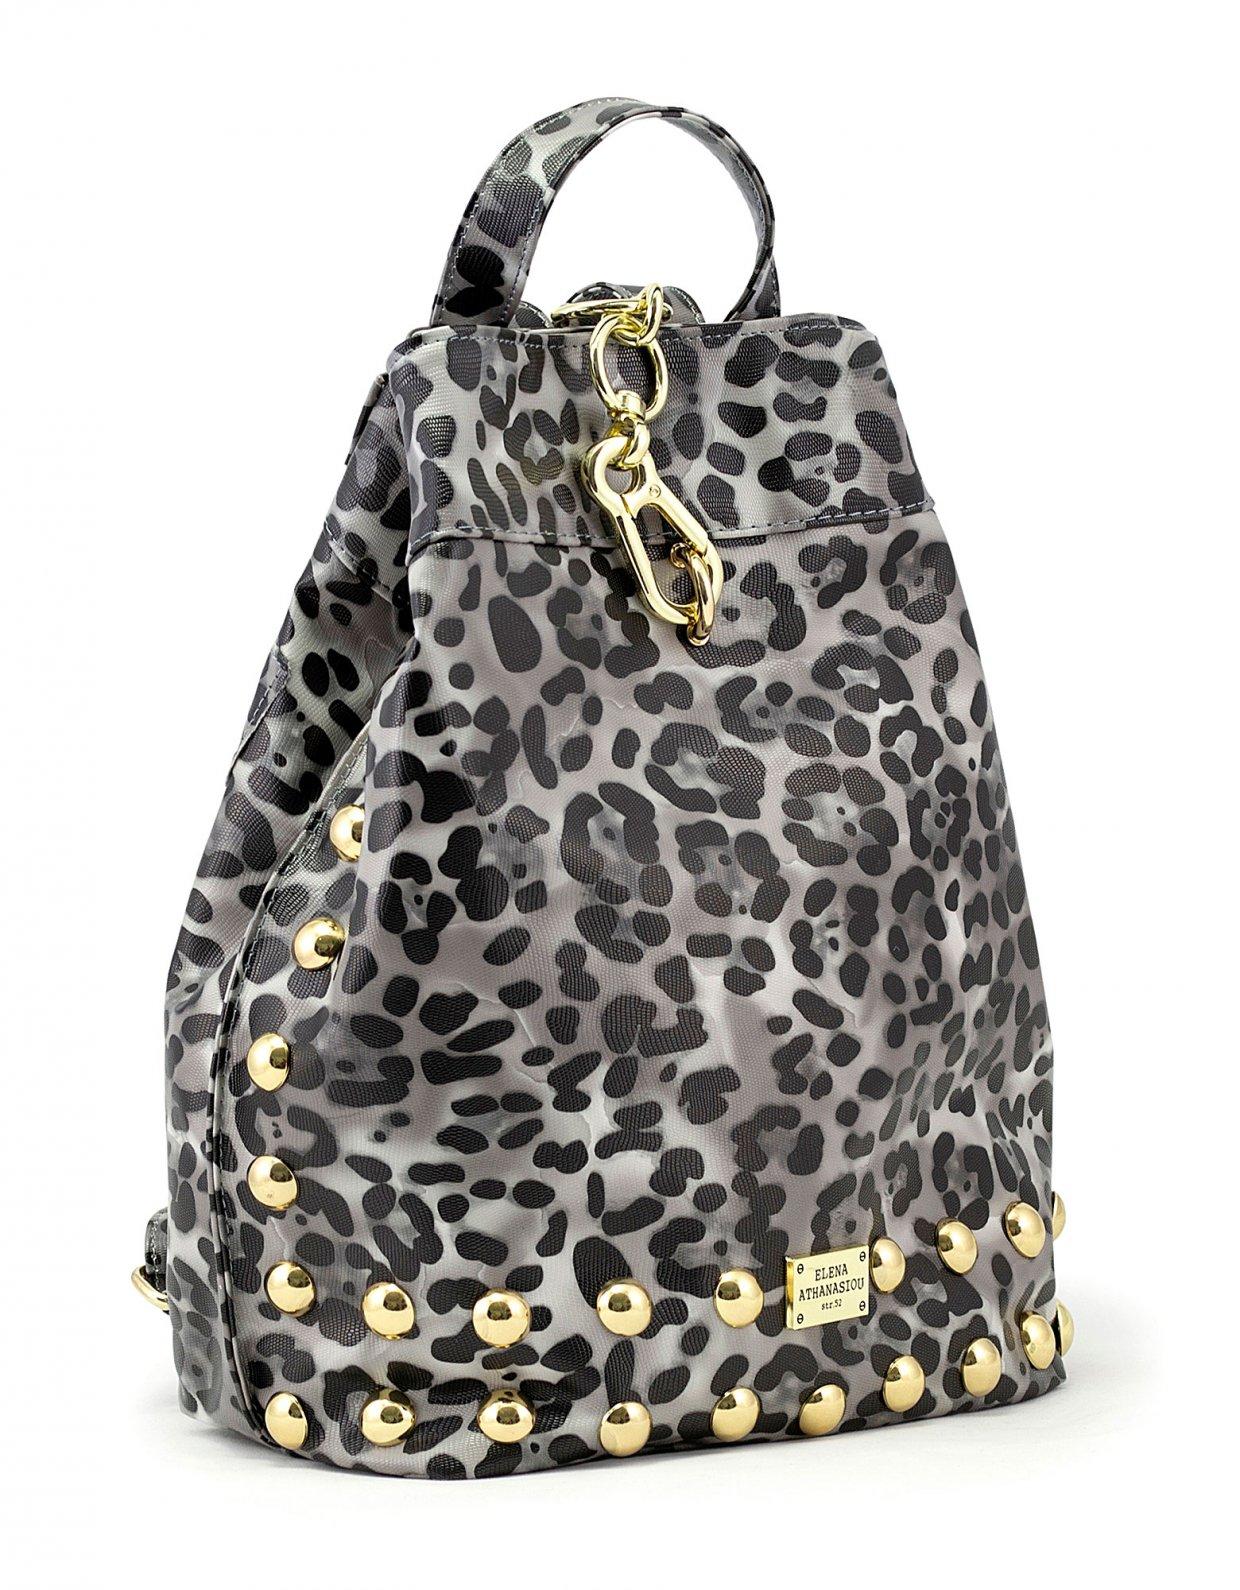 Elena Athanasiou Backpack animal print black gold